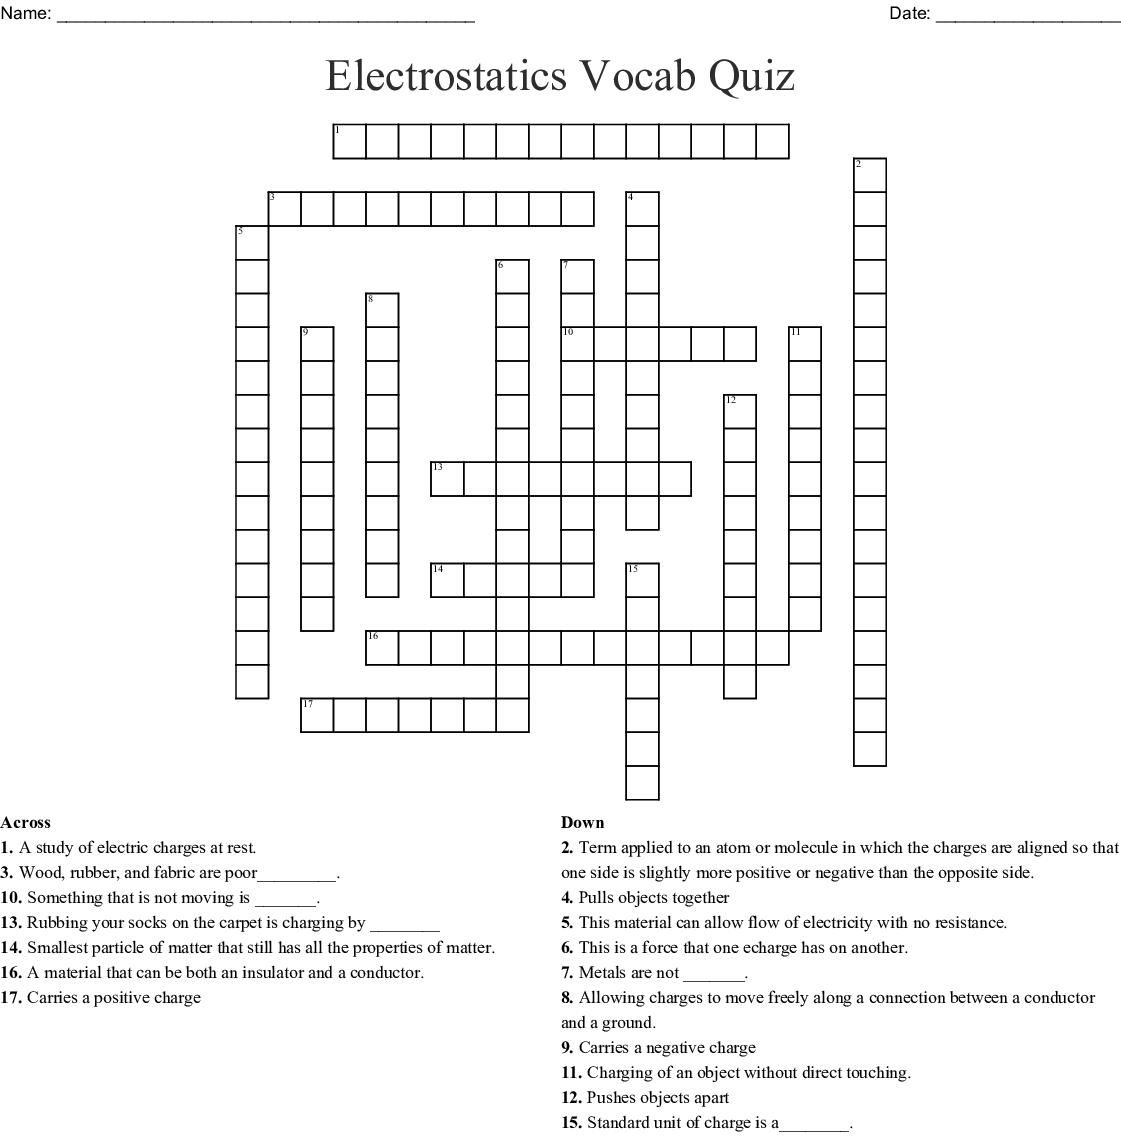 Printable Vocabulary Quiz Crossword Puzzle